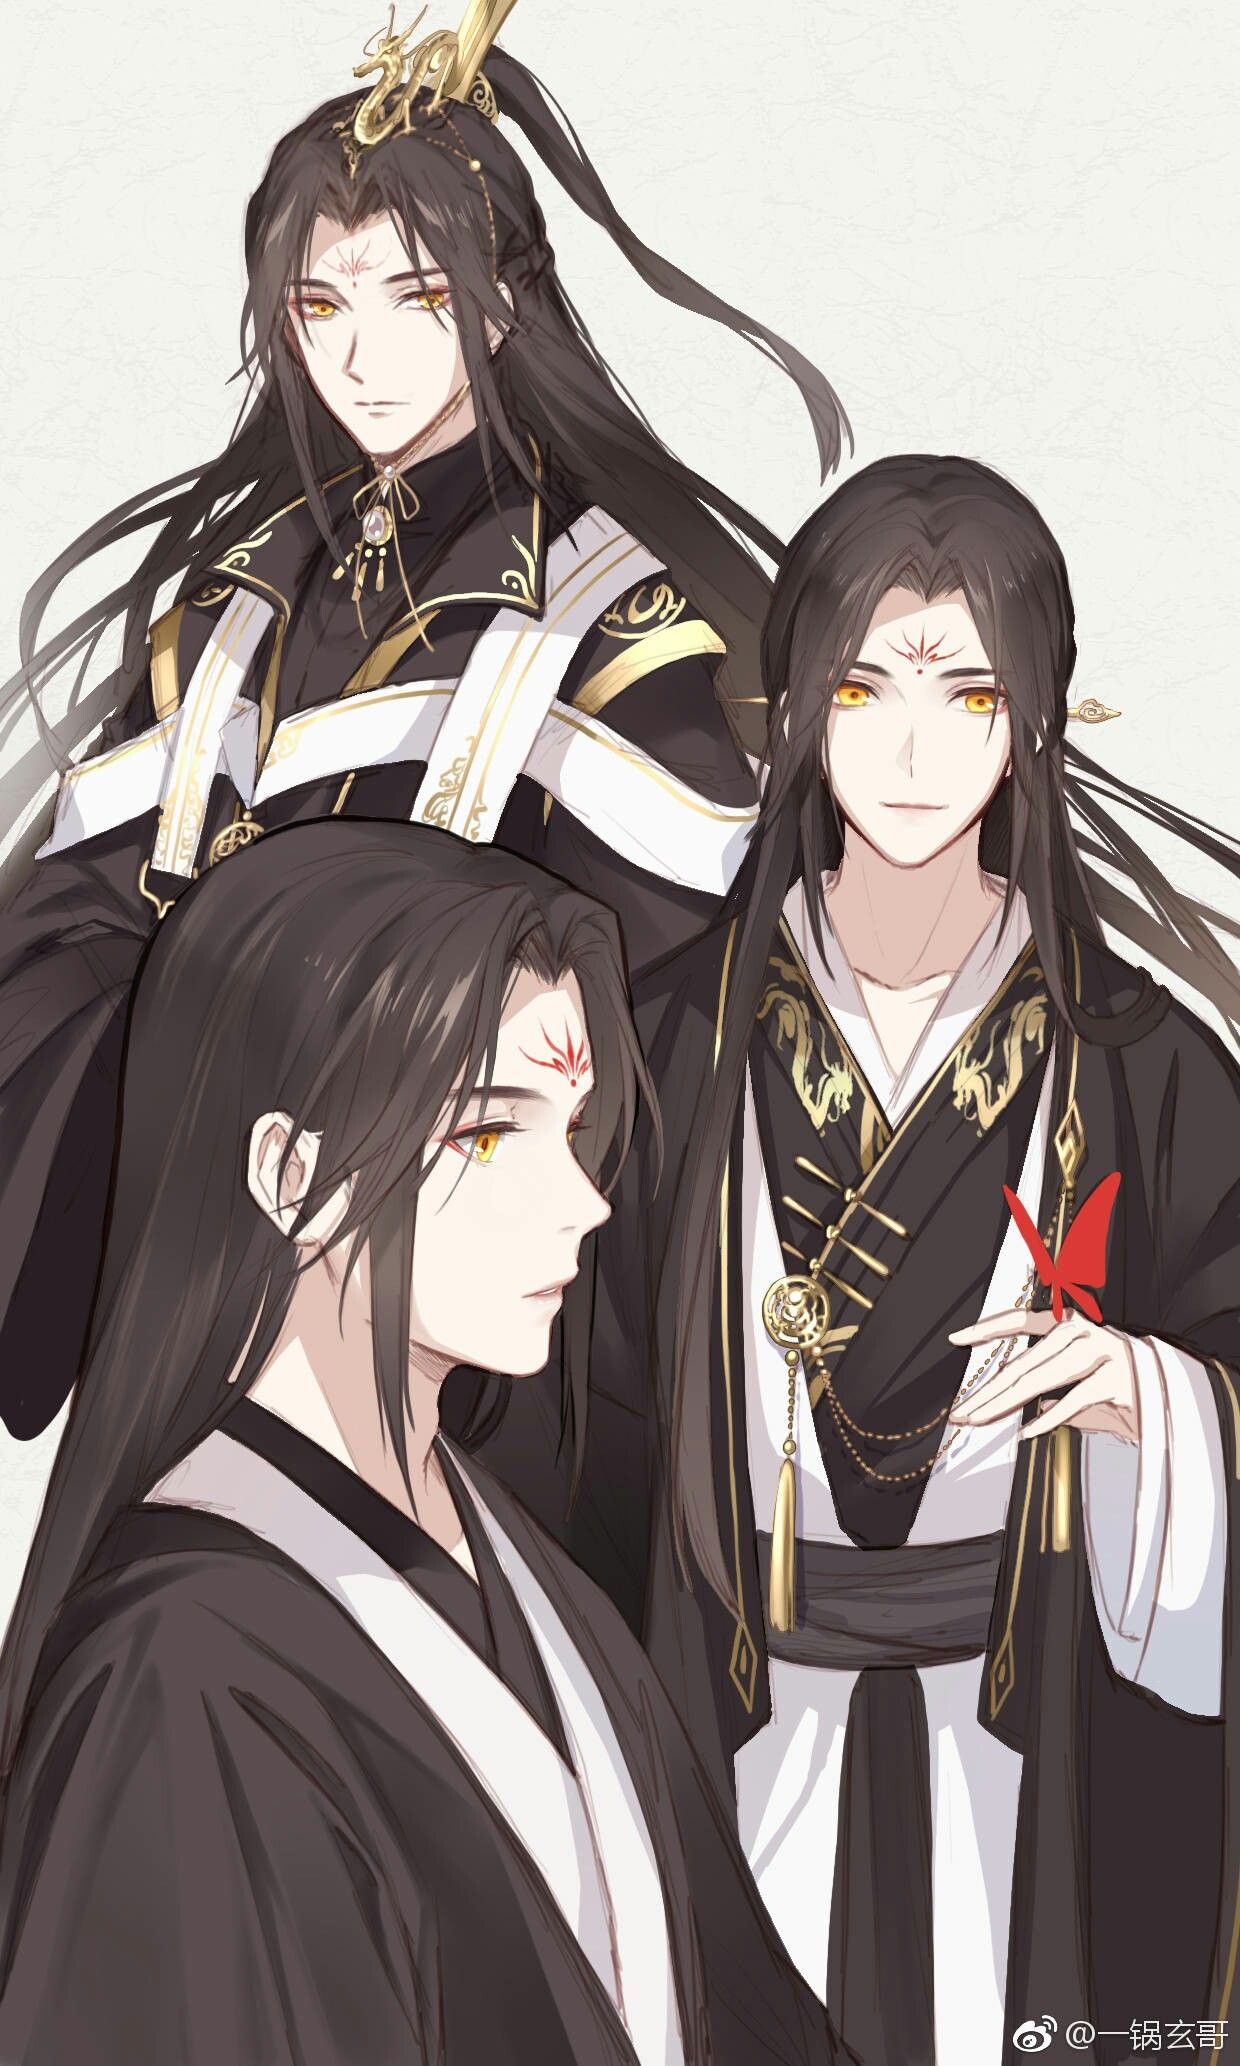 Follow Me Now Tran Jang Anime Guy Long Hair Handsome Anime Guys Anime Boy